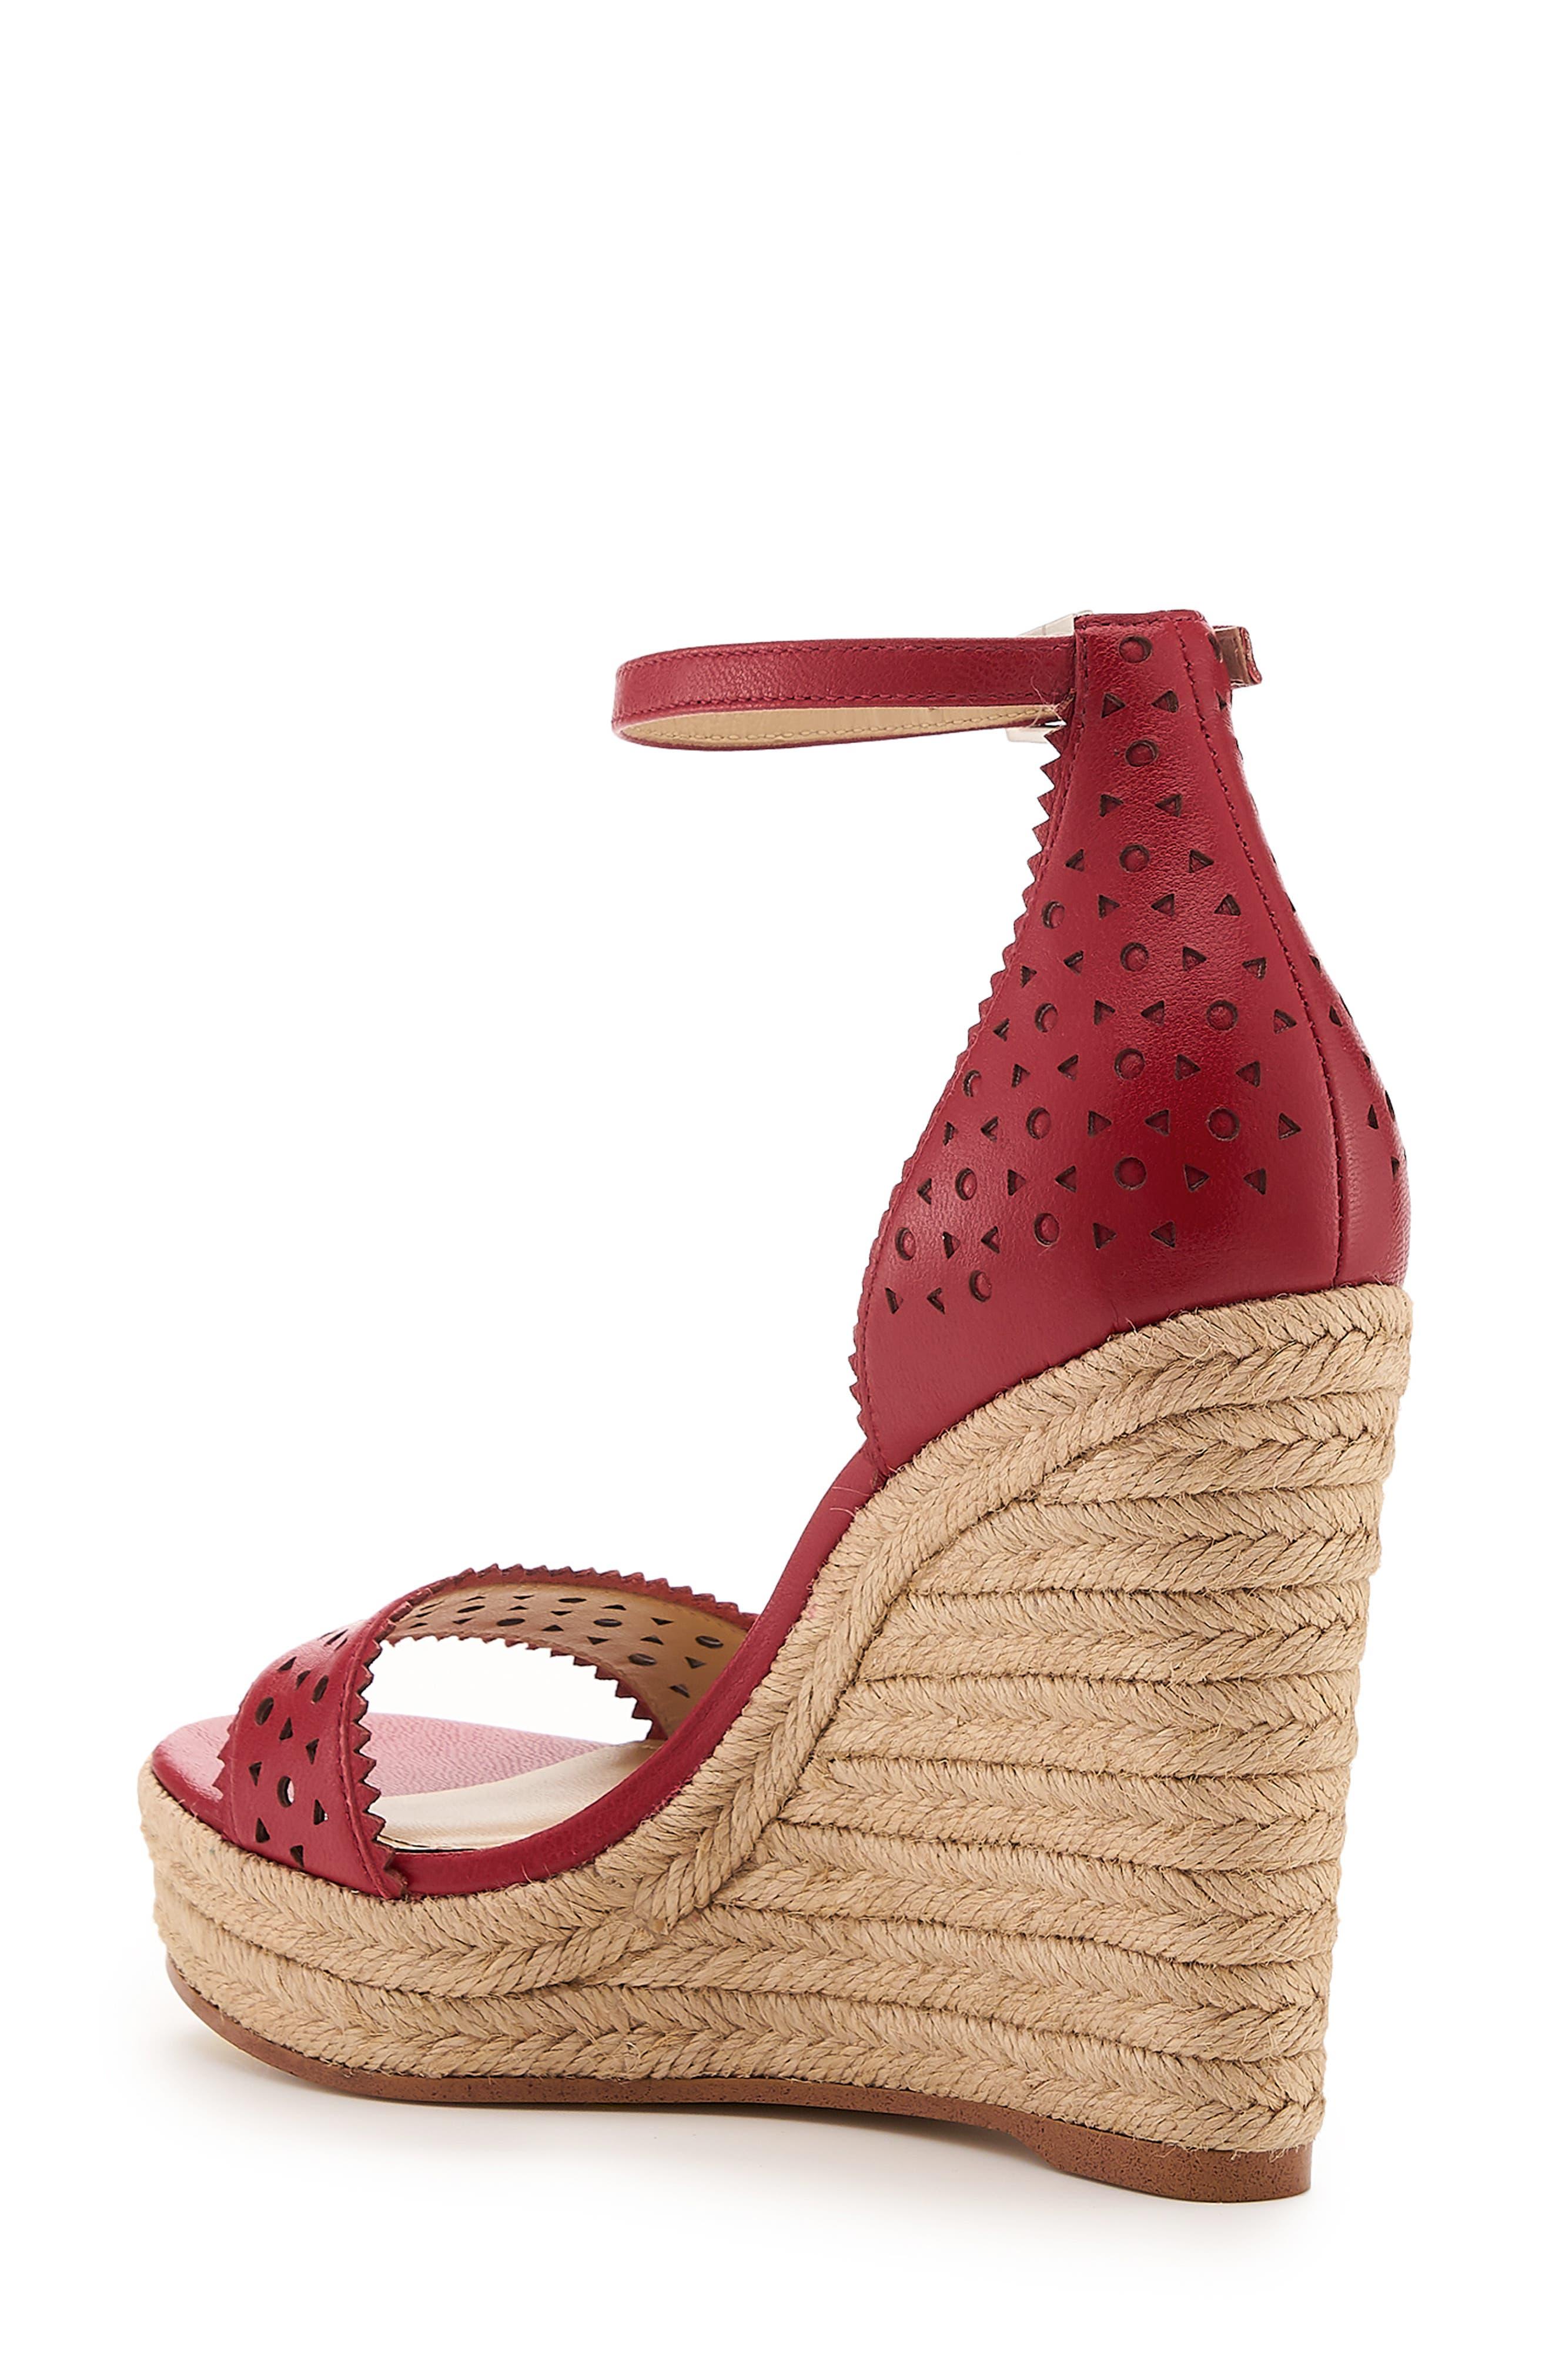 6d9eadf9e4f Women s Botkier Wedge Sandals